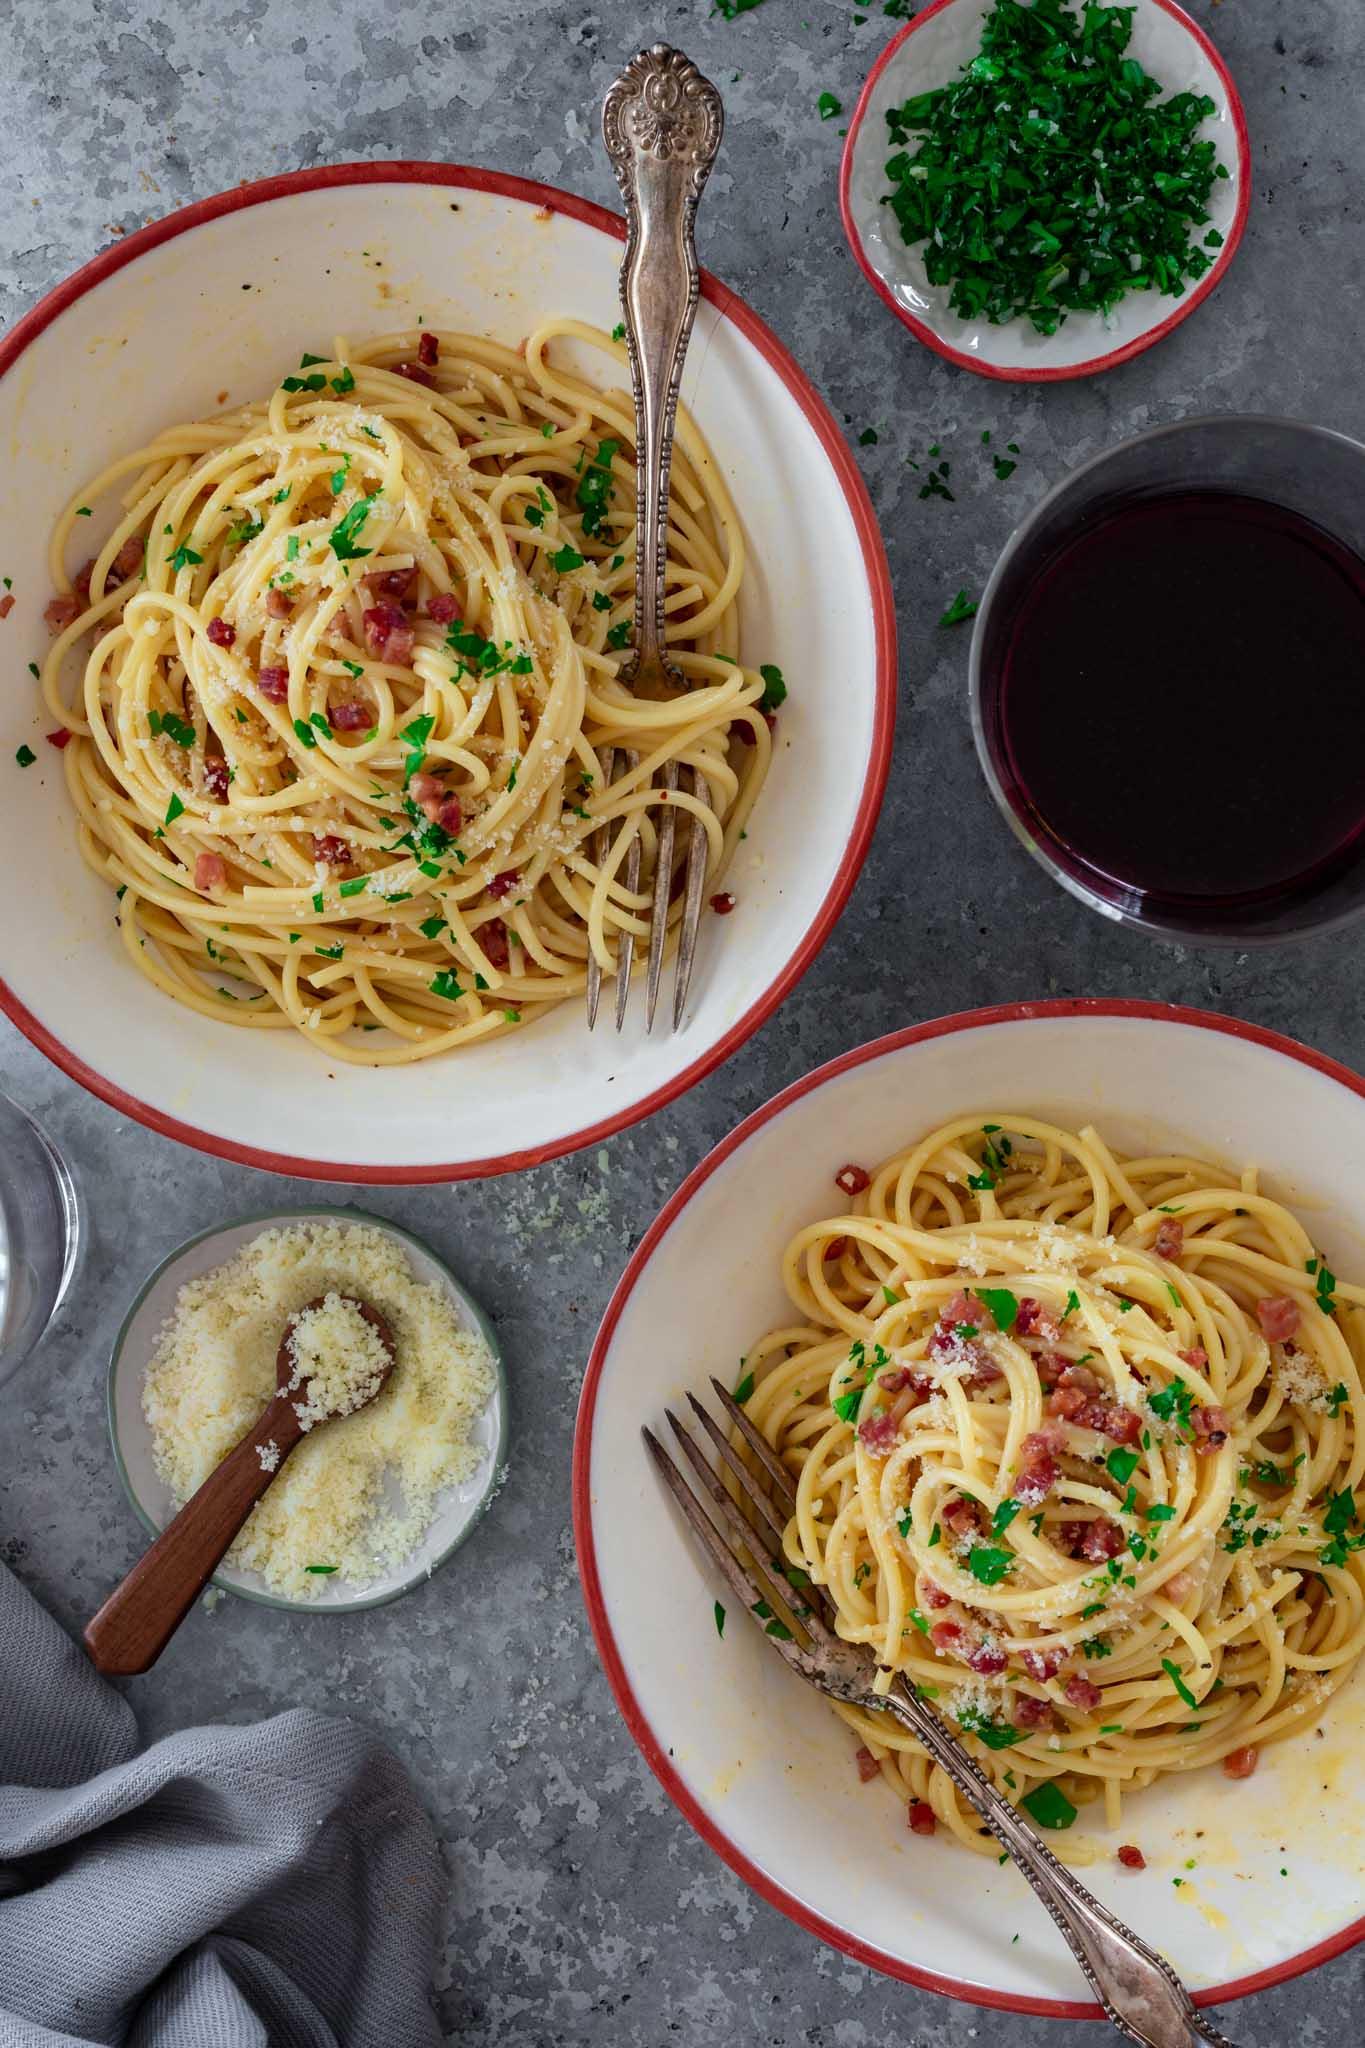 Two servings of Spaghetti Carbonara